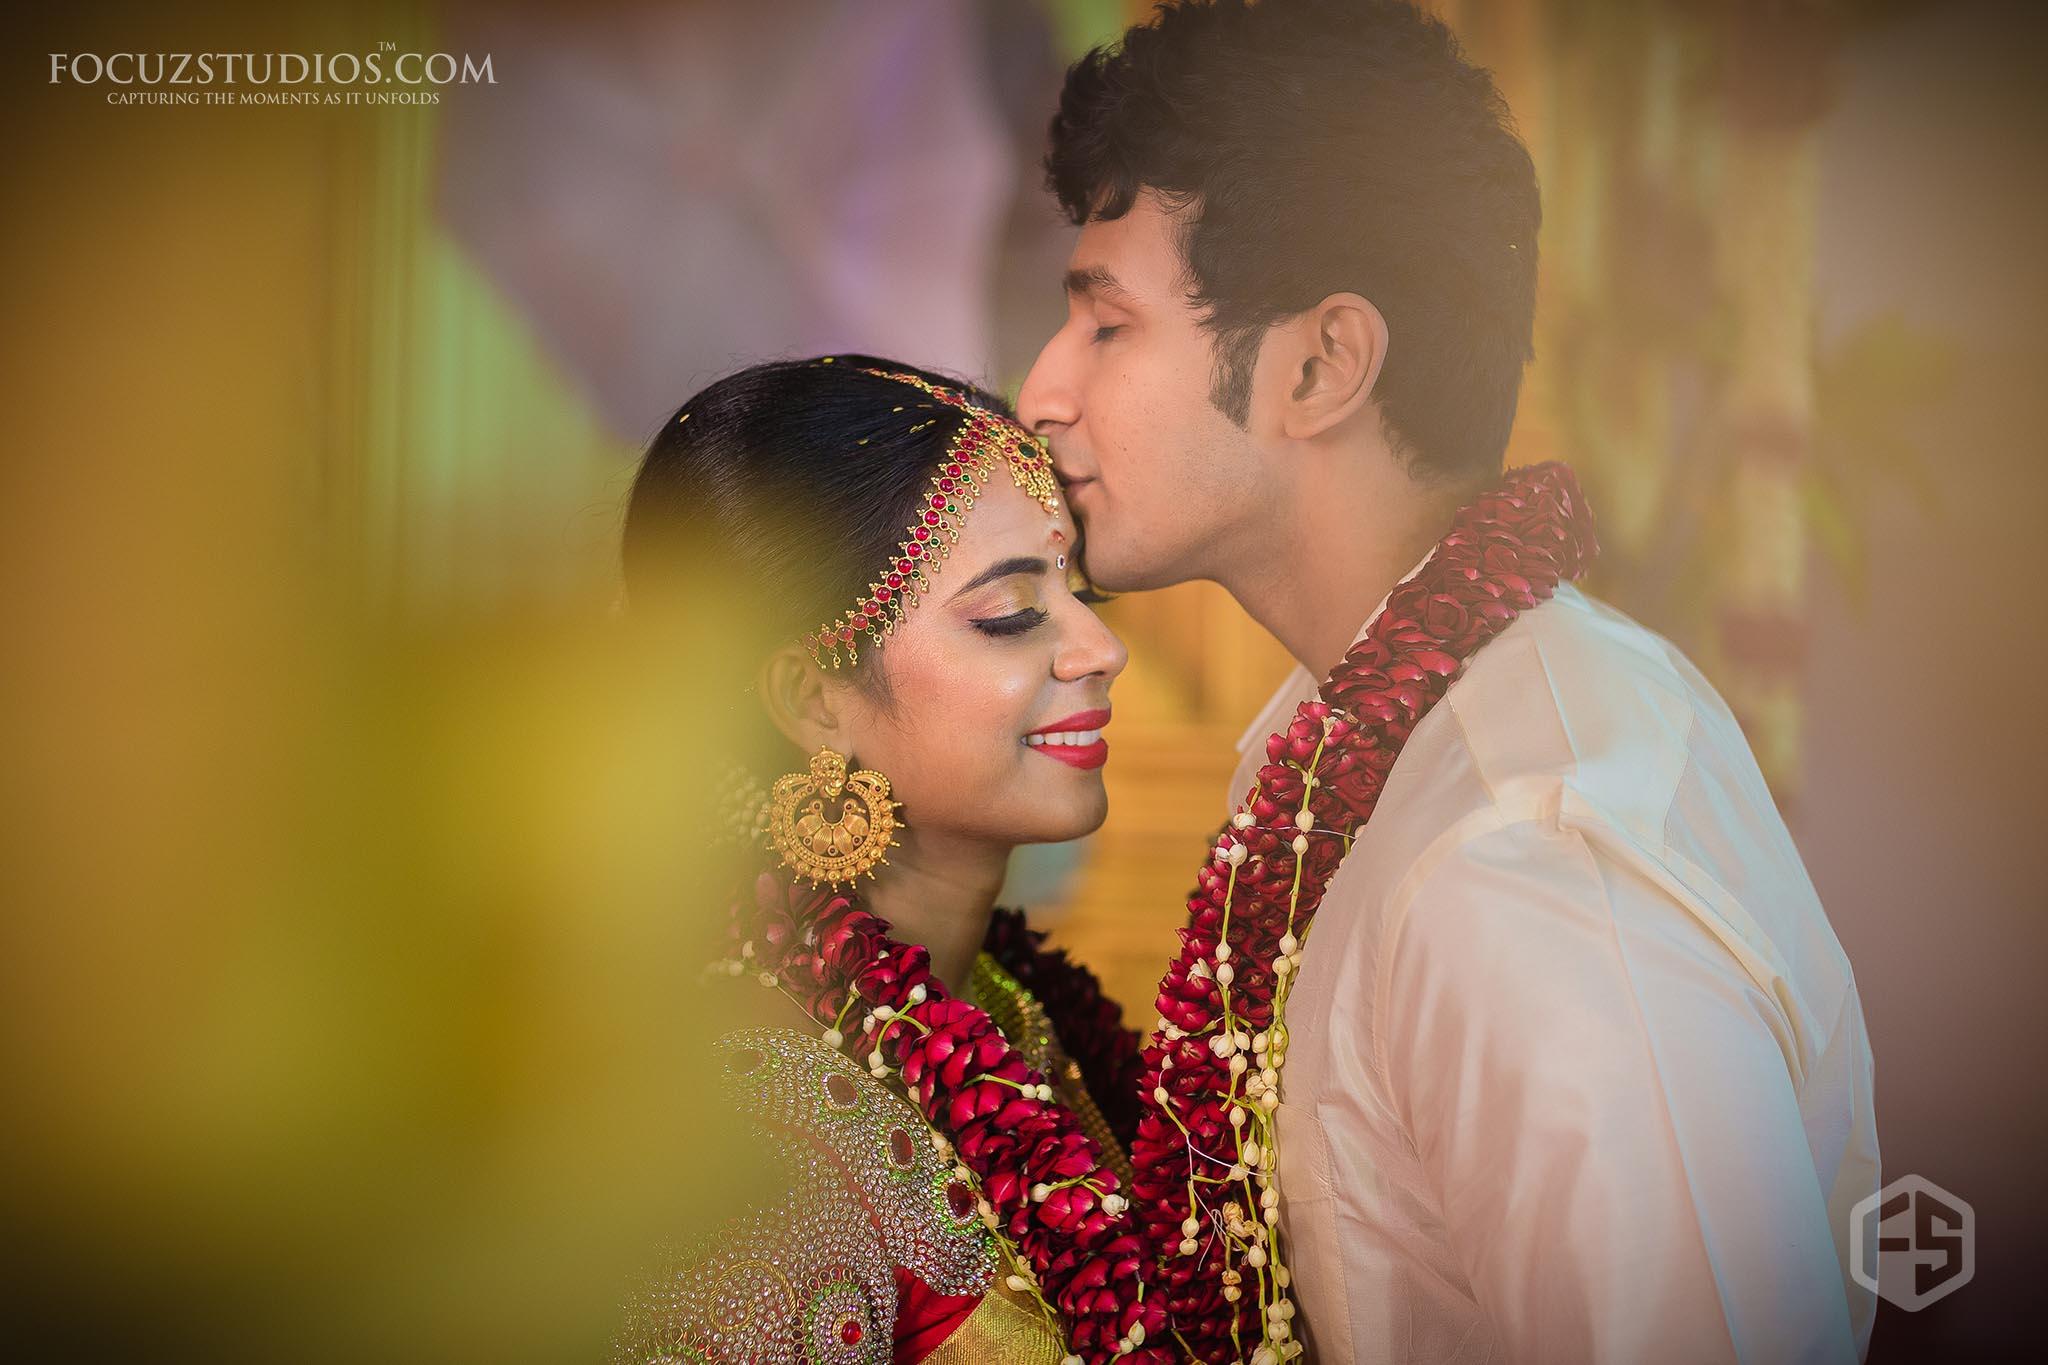 Best South Indian Wedding Photography Trichy Focuz Studios